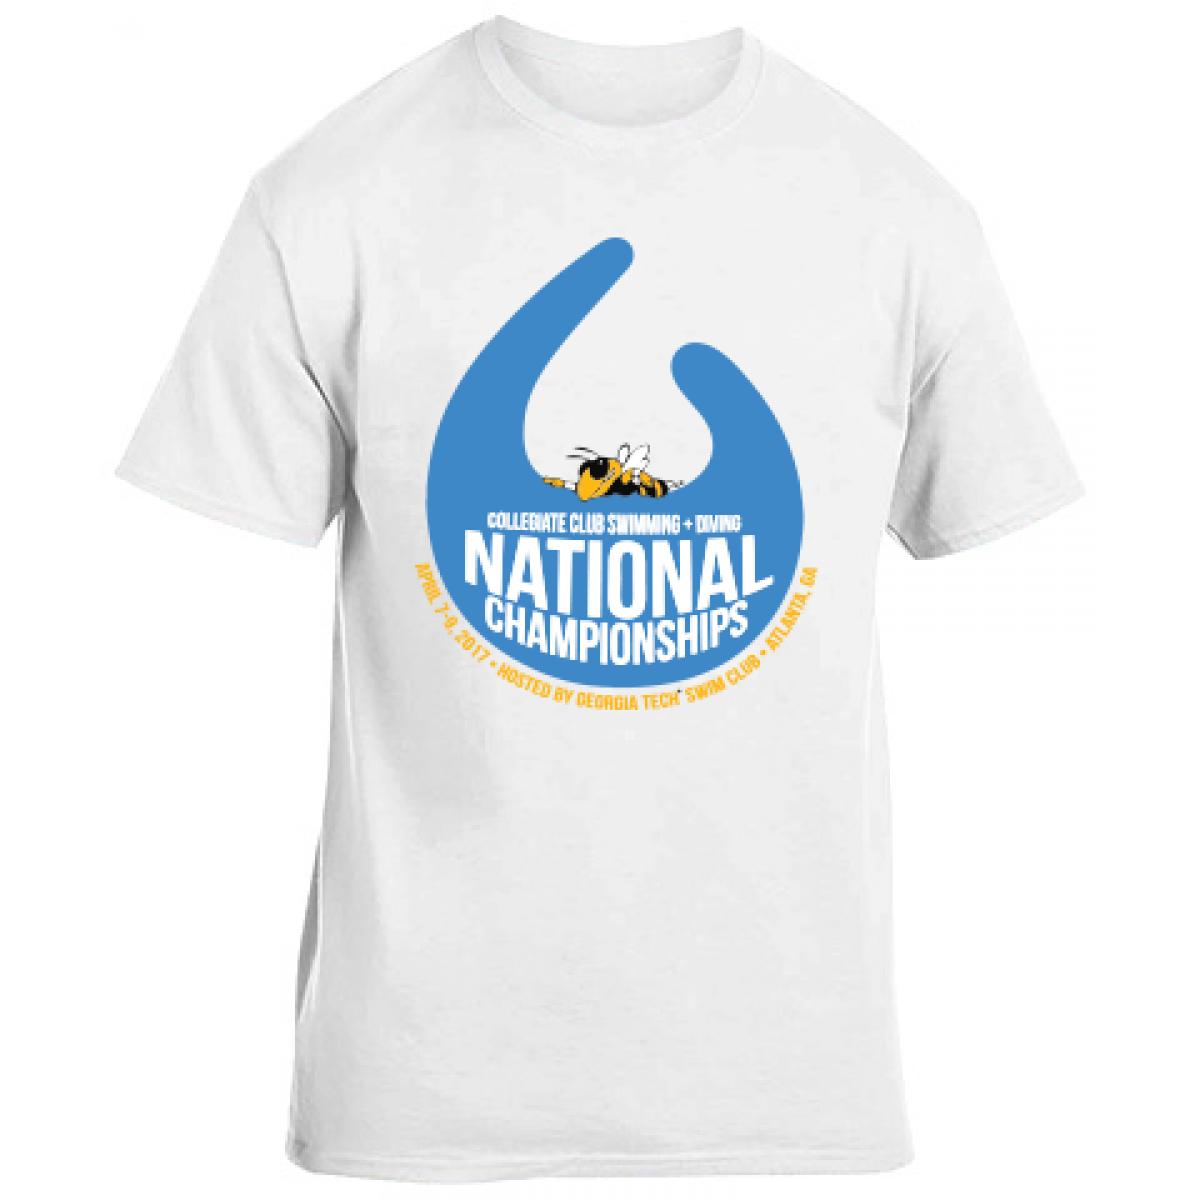 Collegiate Club Cotton Short Sleeve T-Shirt-YM